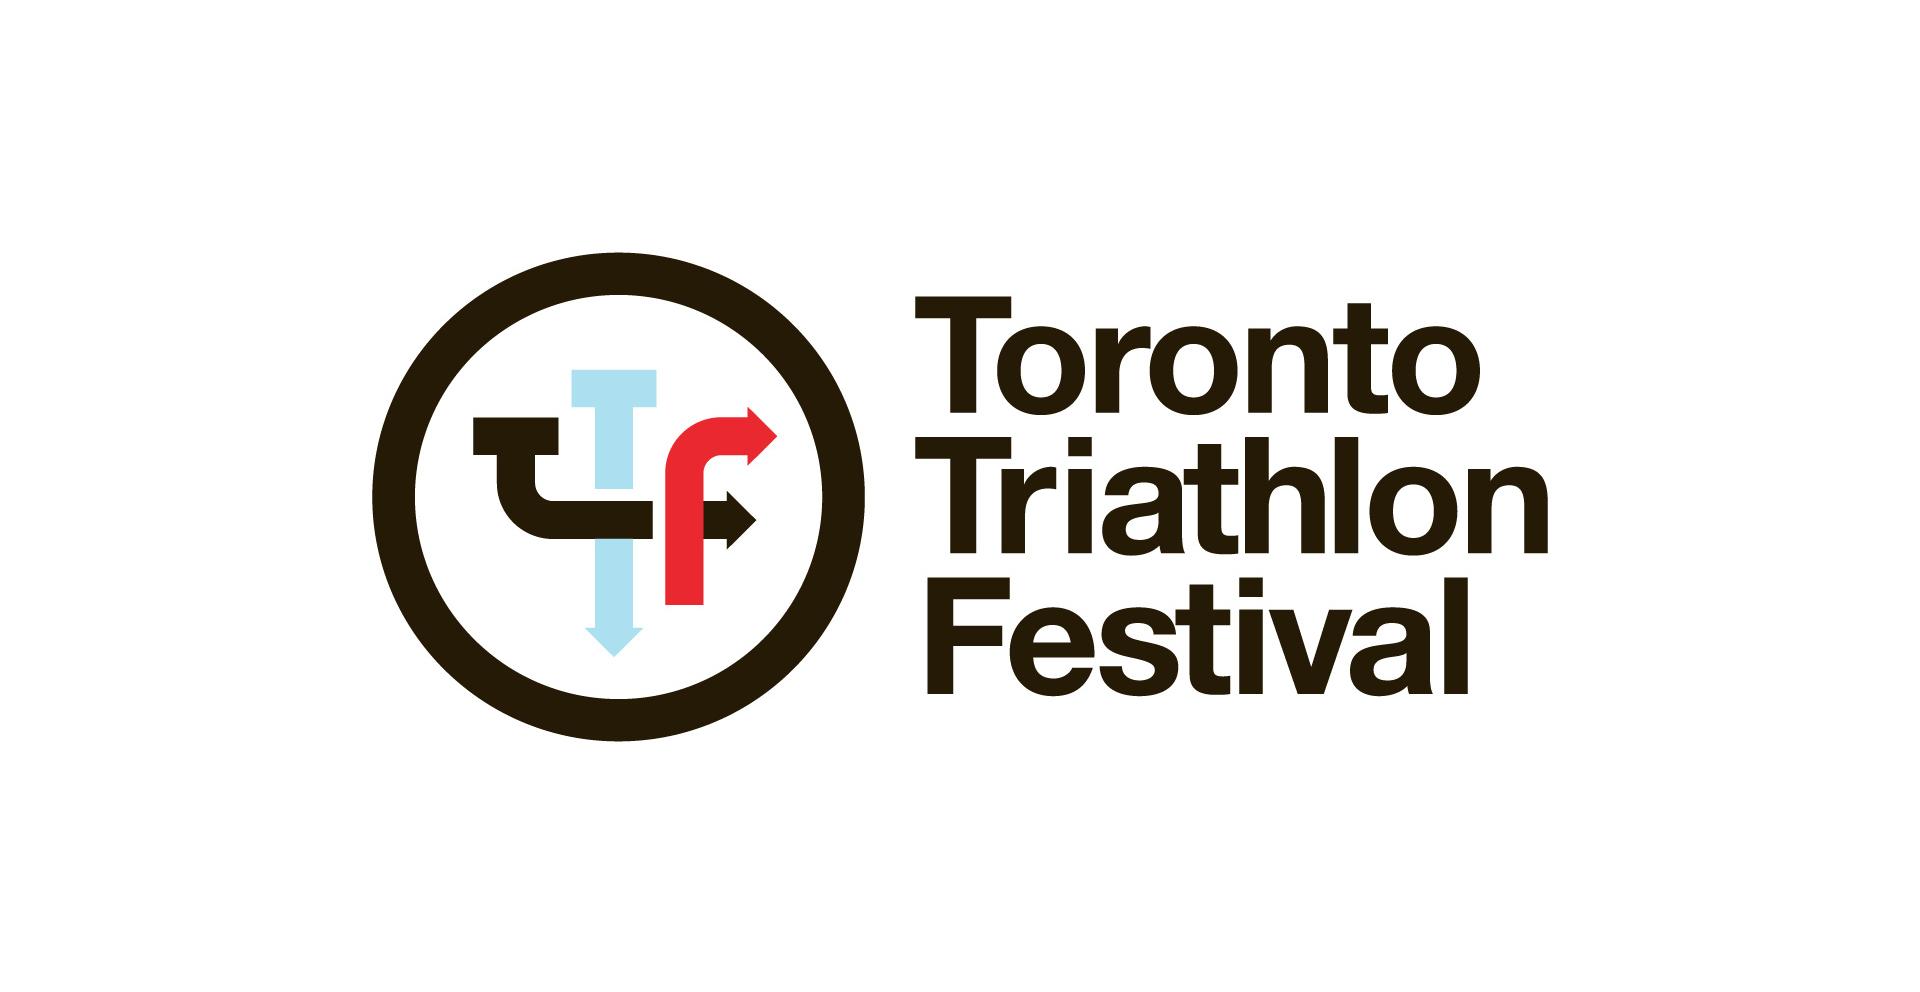 Toronto Triathlon Festival logo